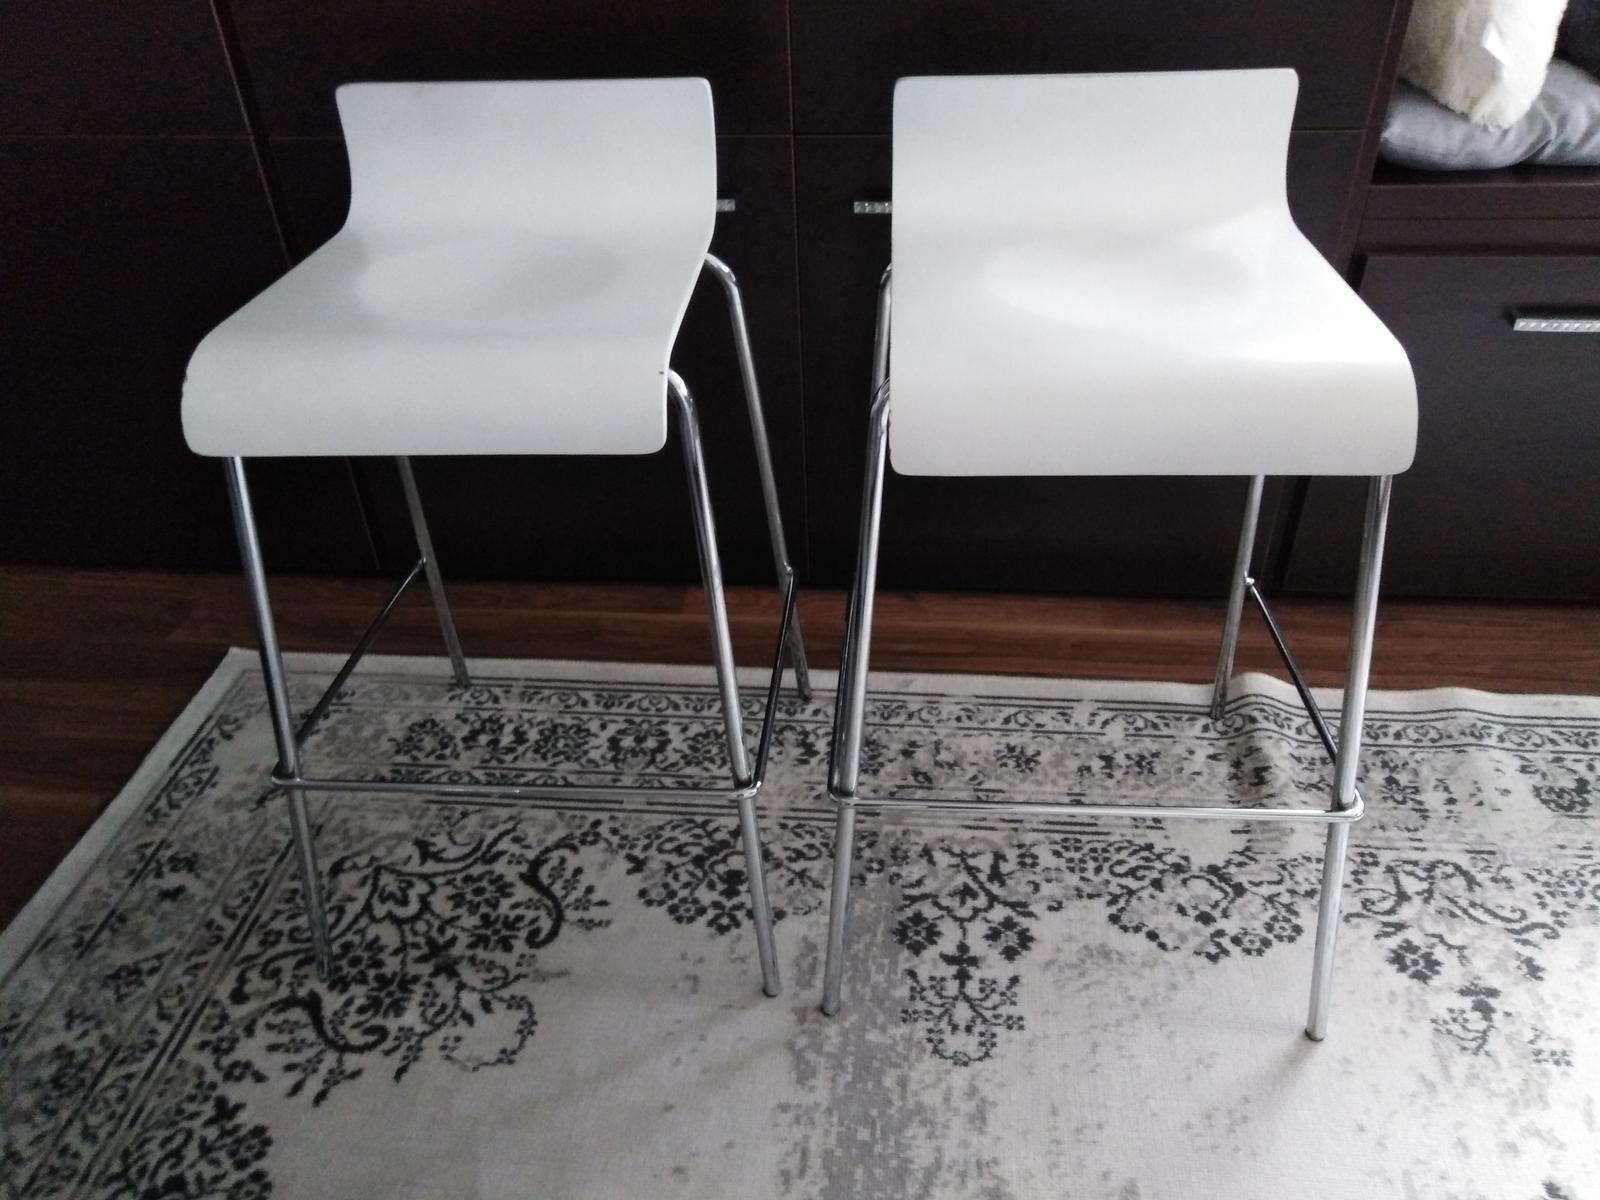 Barove stoličky 2 ks - Obrázok č. 1